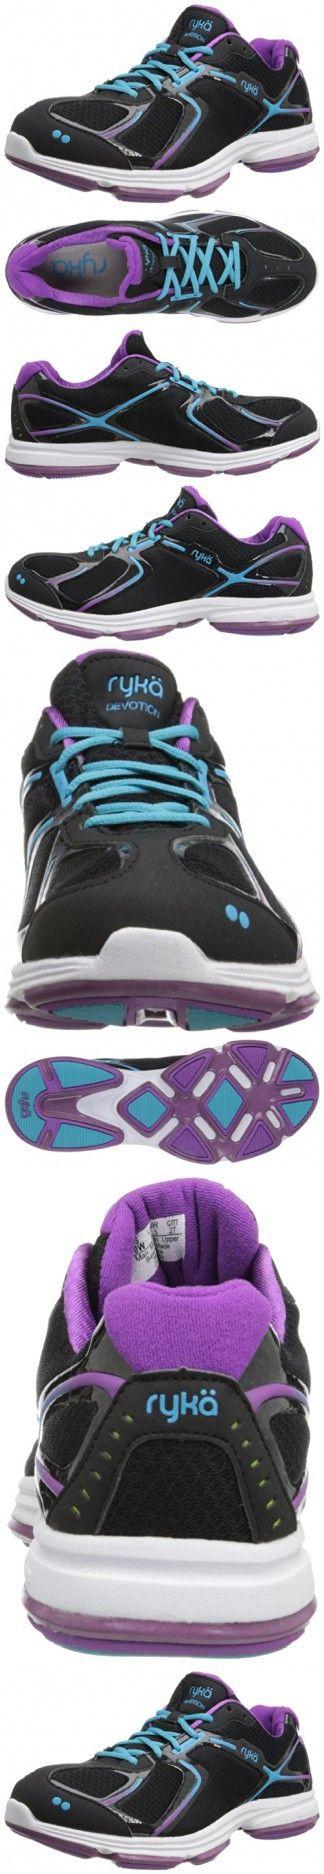 Zapatillas para caminar RYKA Women's Sky, blanco / azul, 8 W US